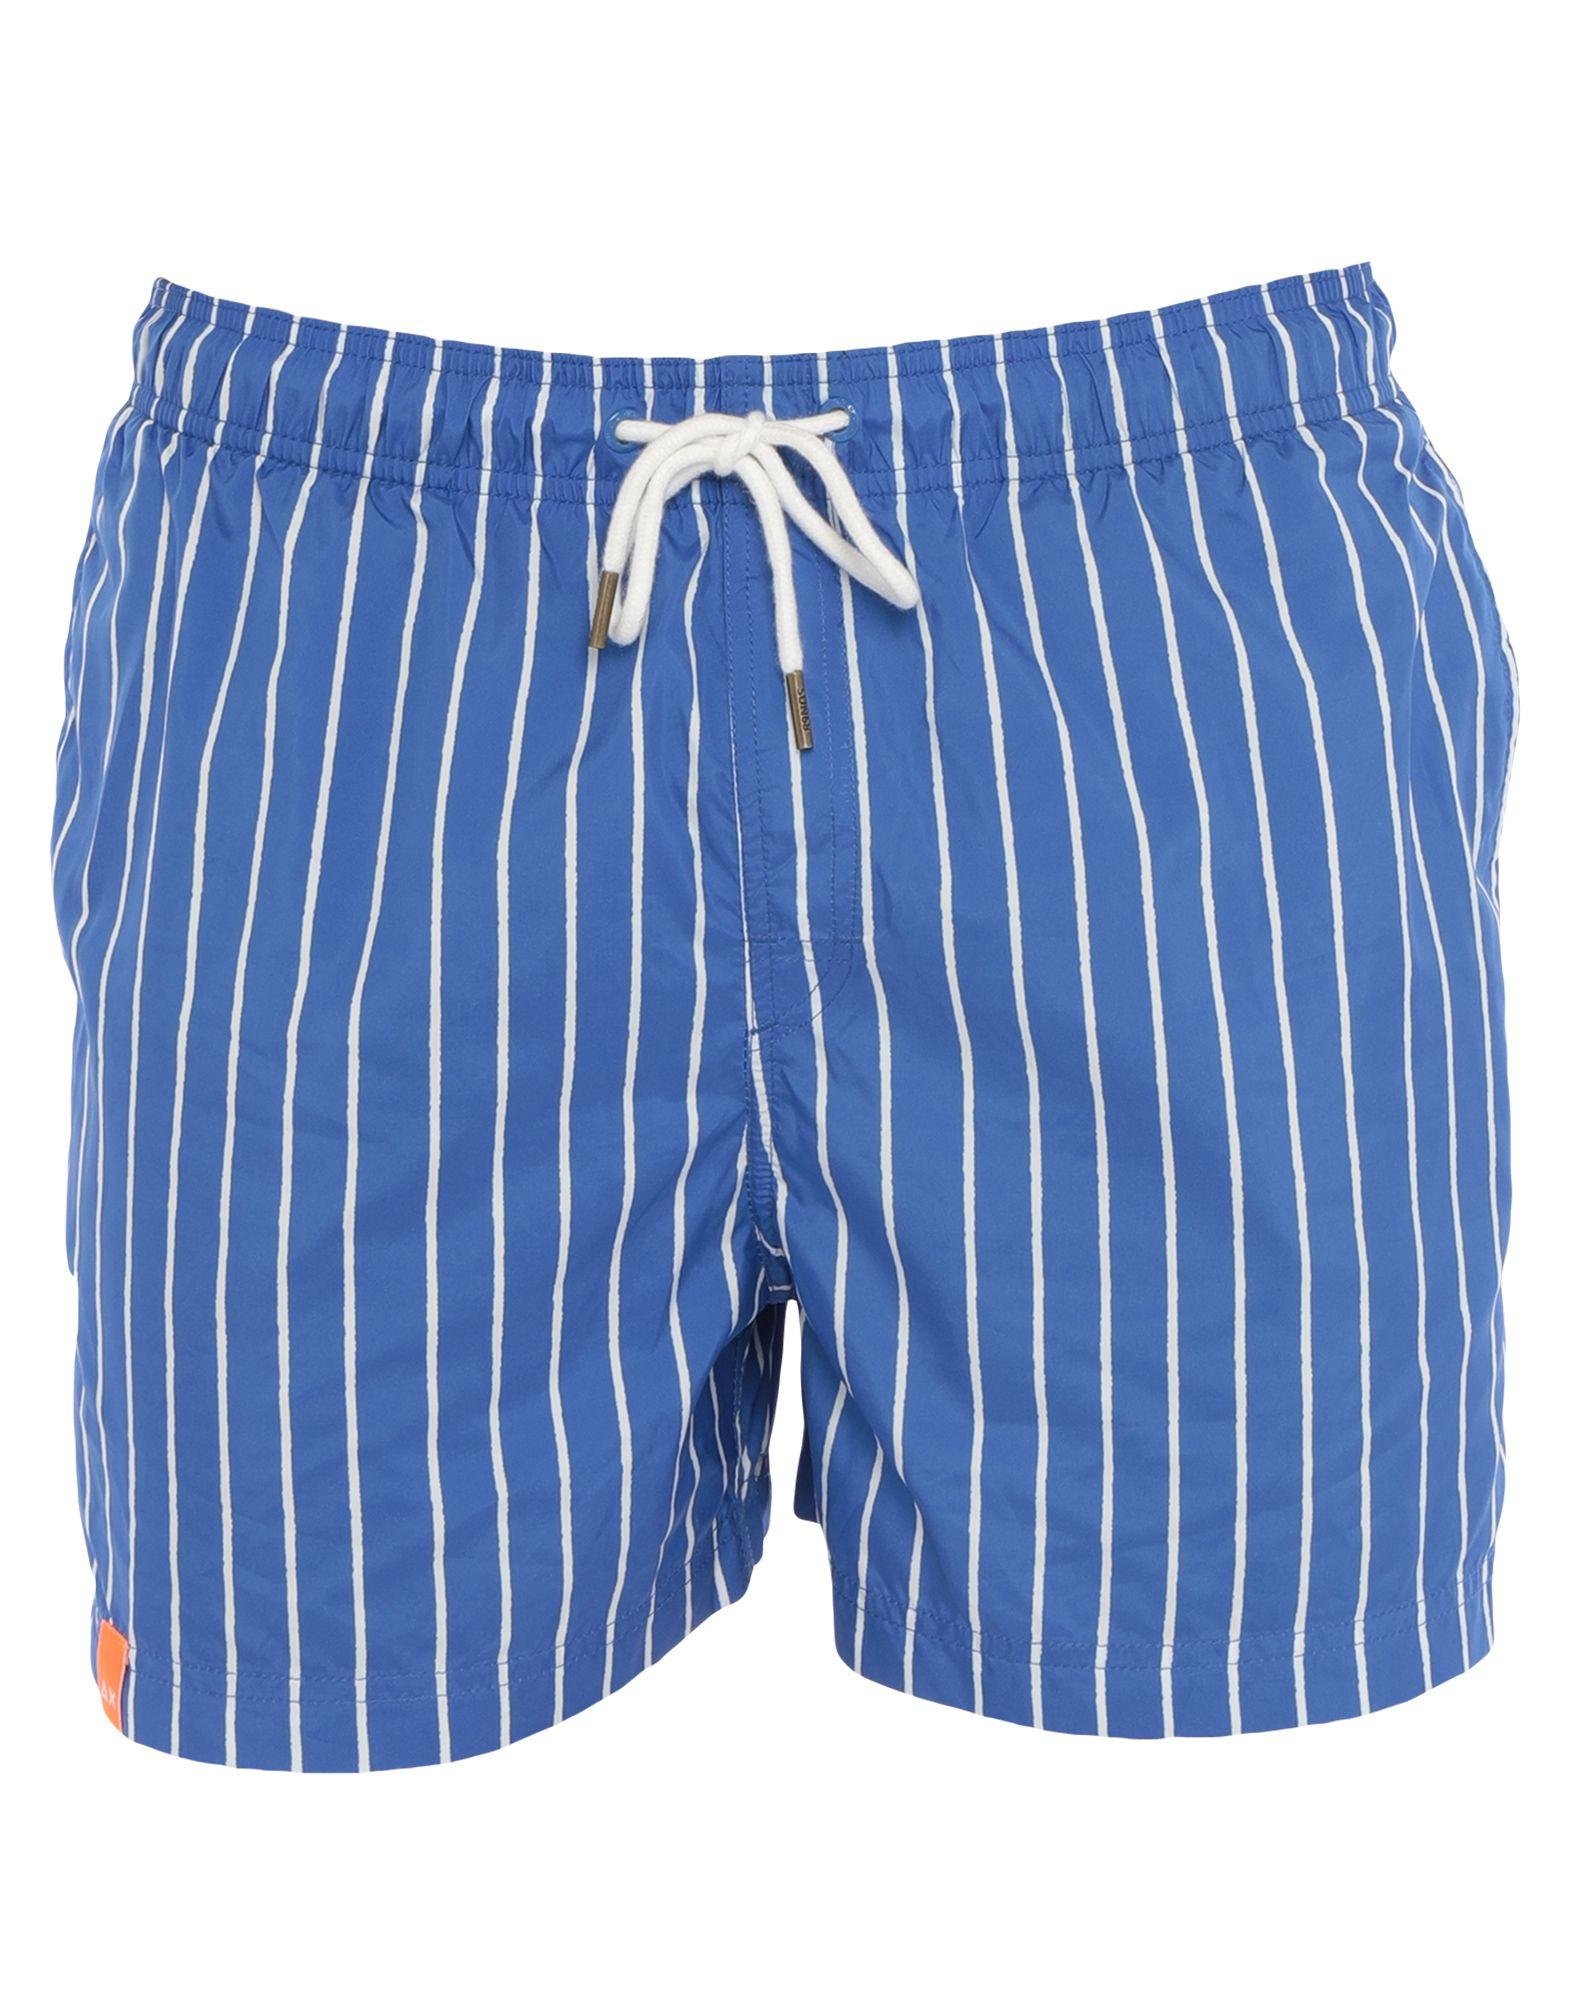 Фото - SUN 68 Шорты для плавания шорты burberry 8010135 размер 6m 68 pale mint